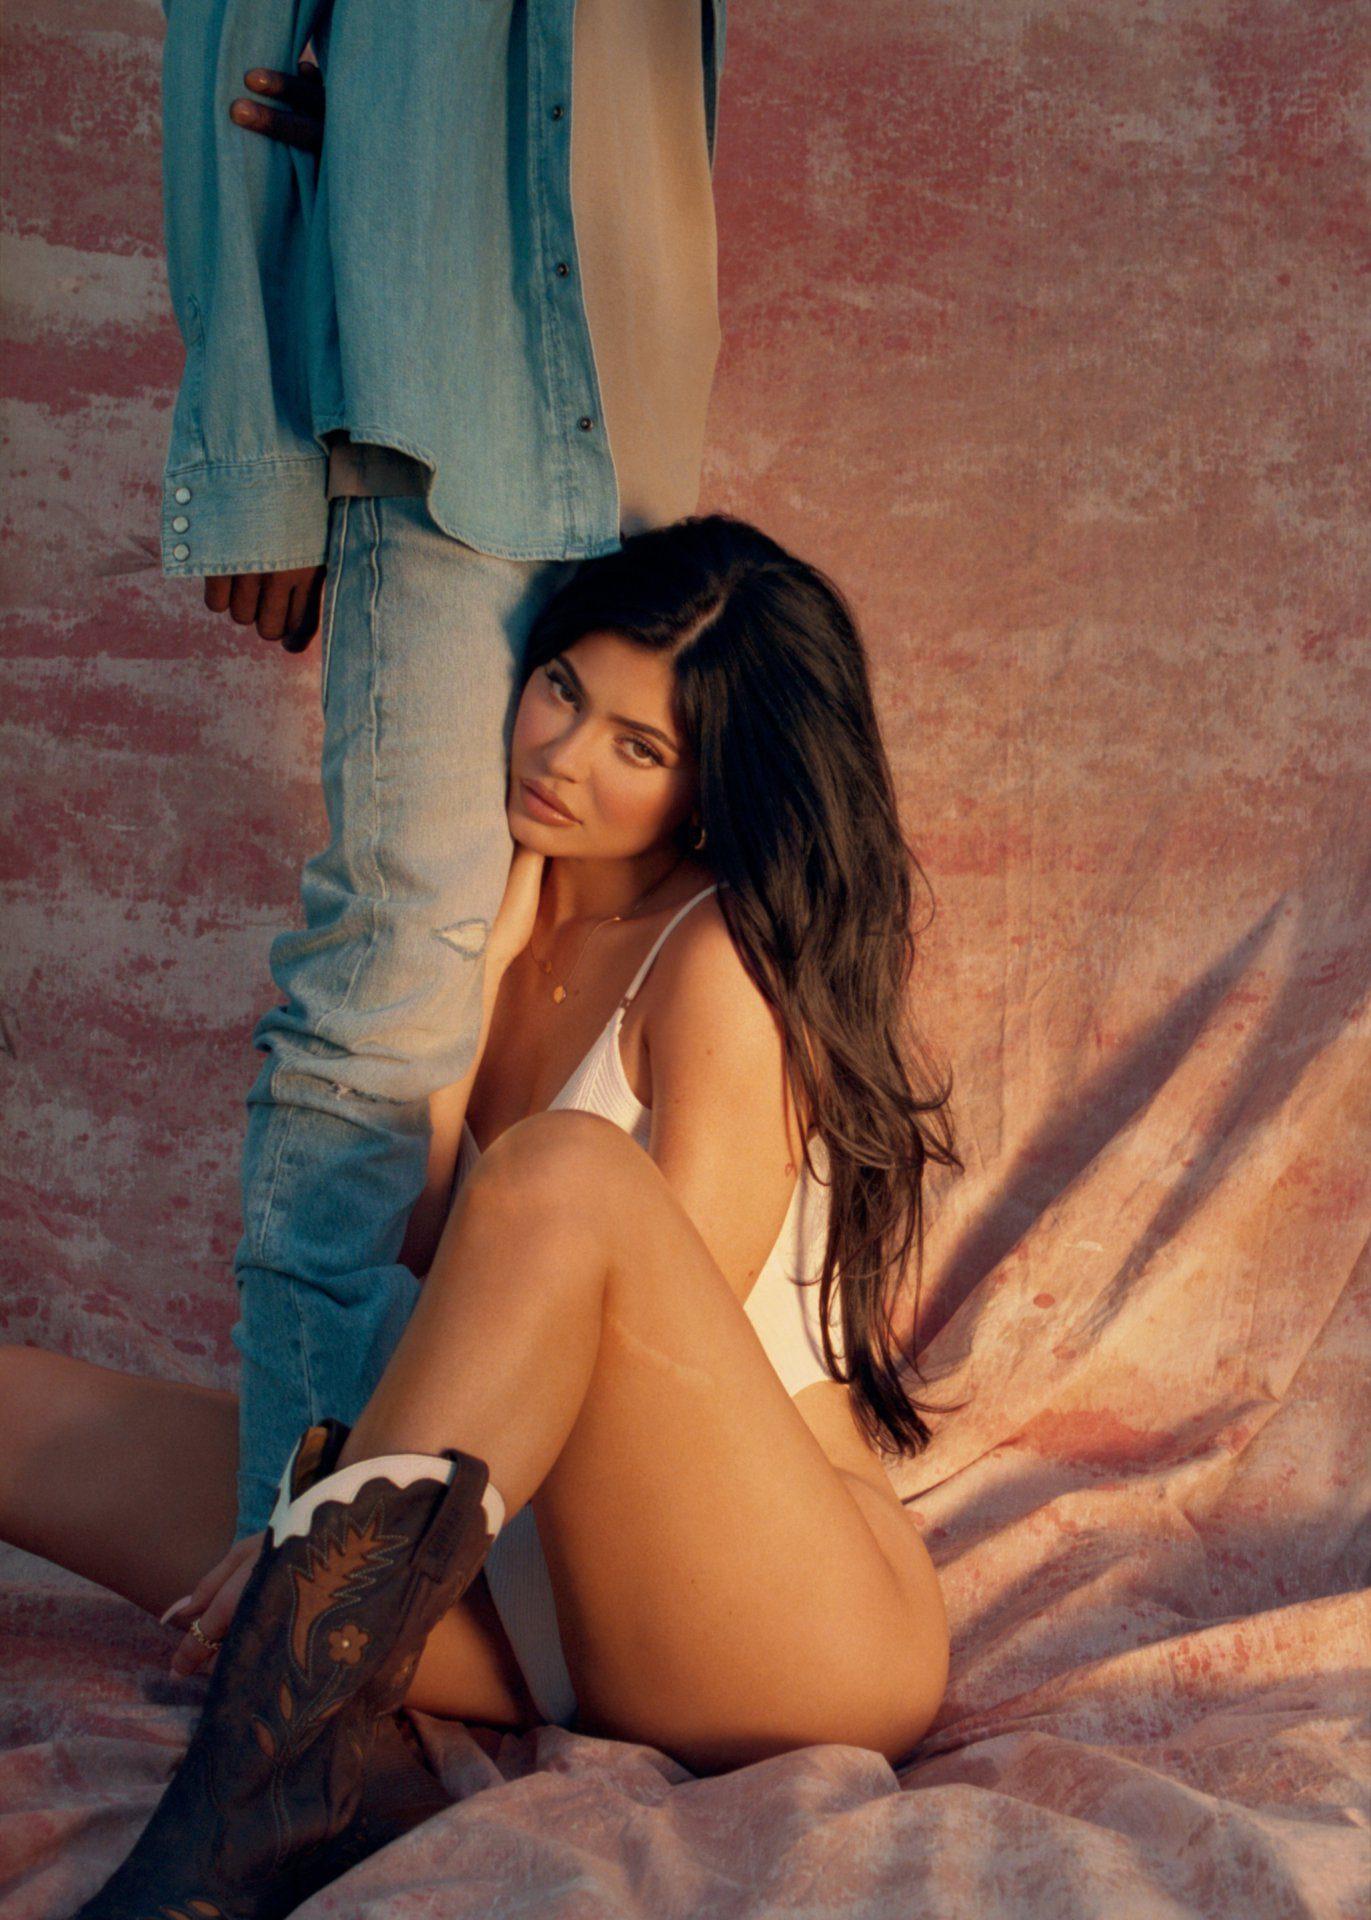 Kylie Jenner Playboy Photoshoot Leaked Eepcqy